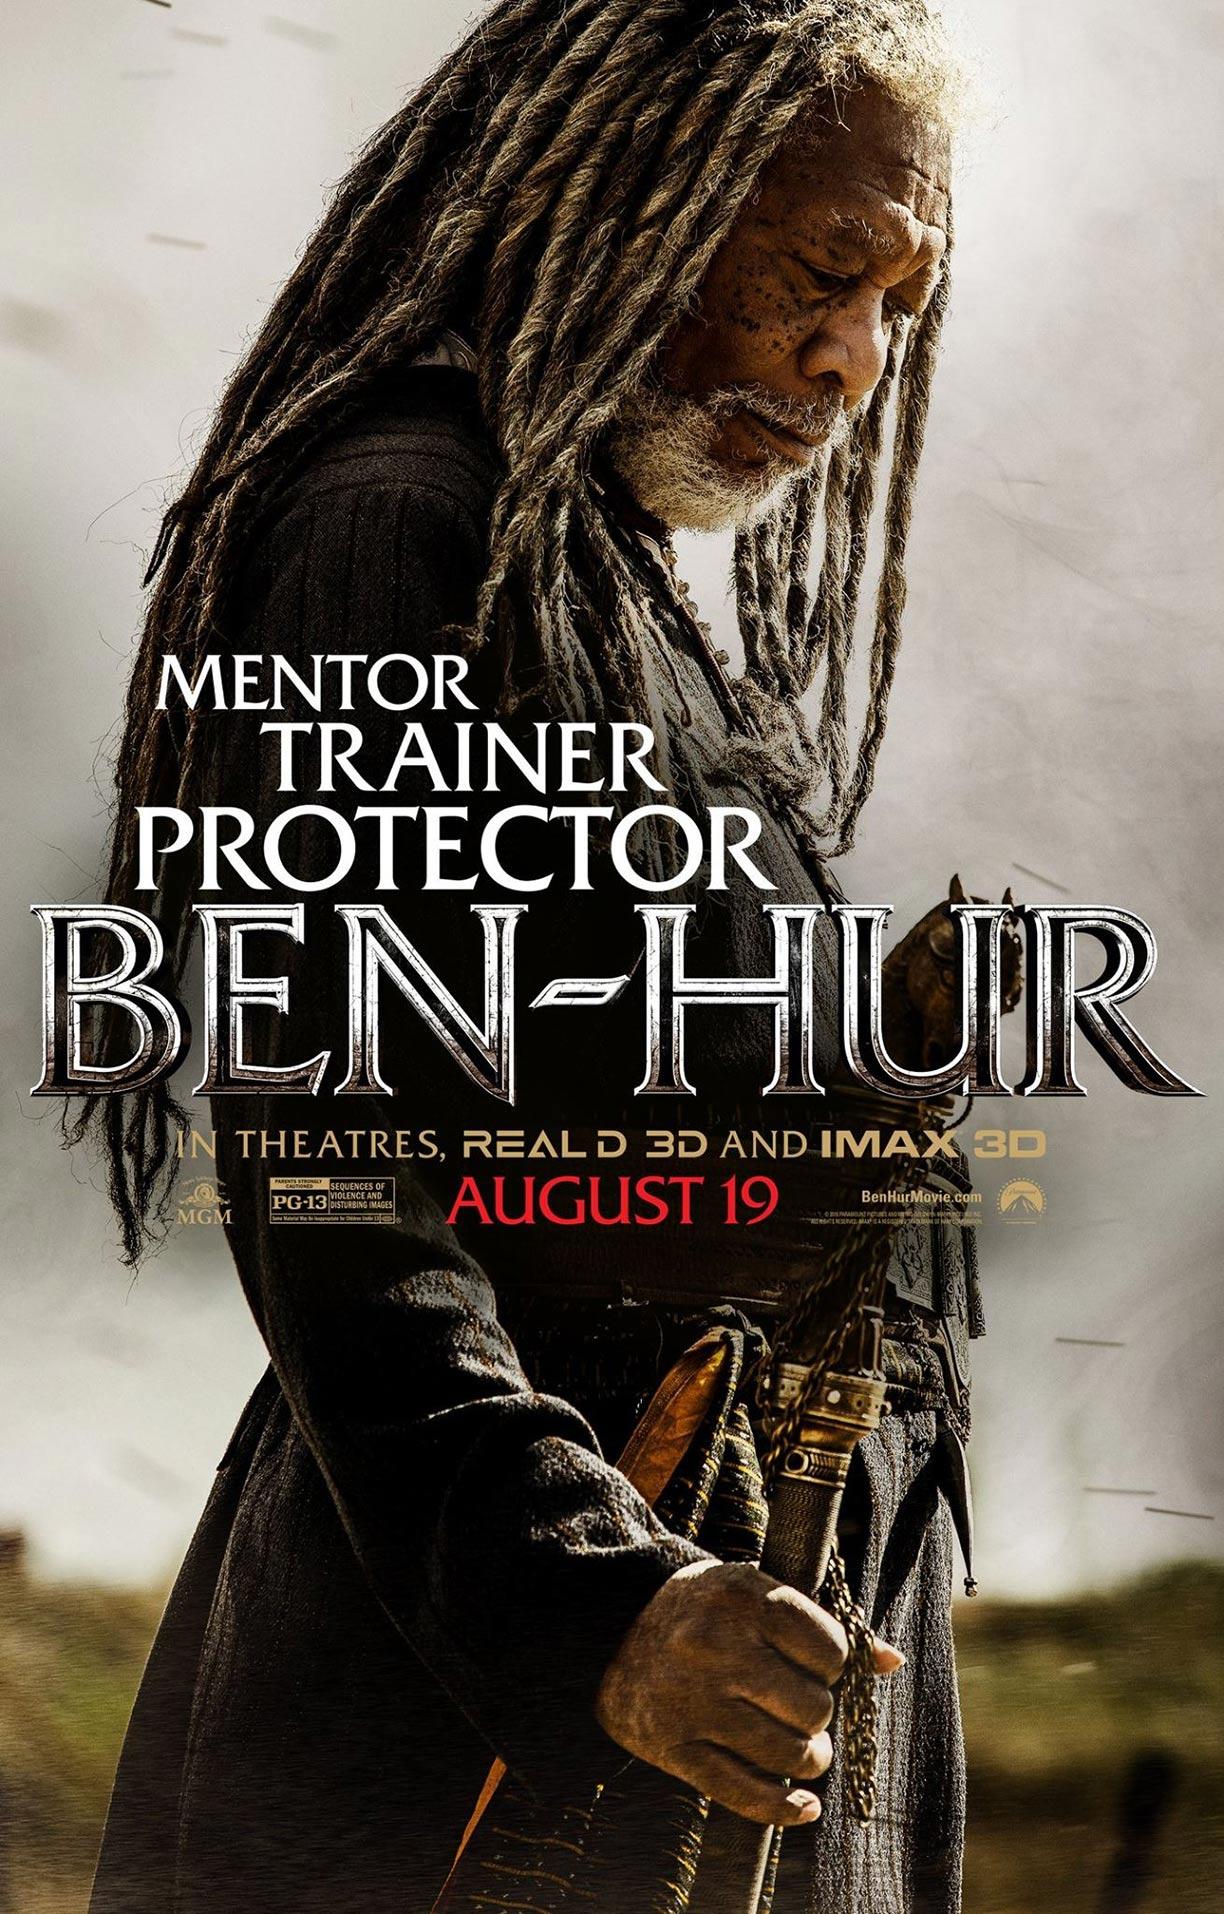 Ben Hur 2016 Poster 1 Trailer Addict